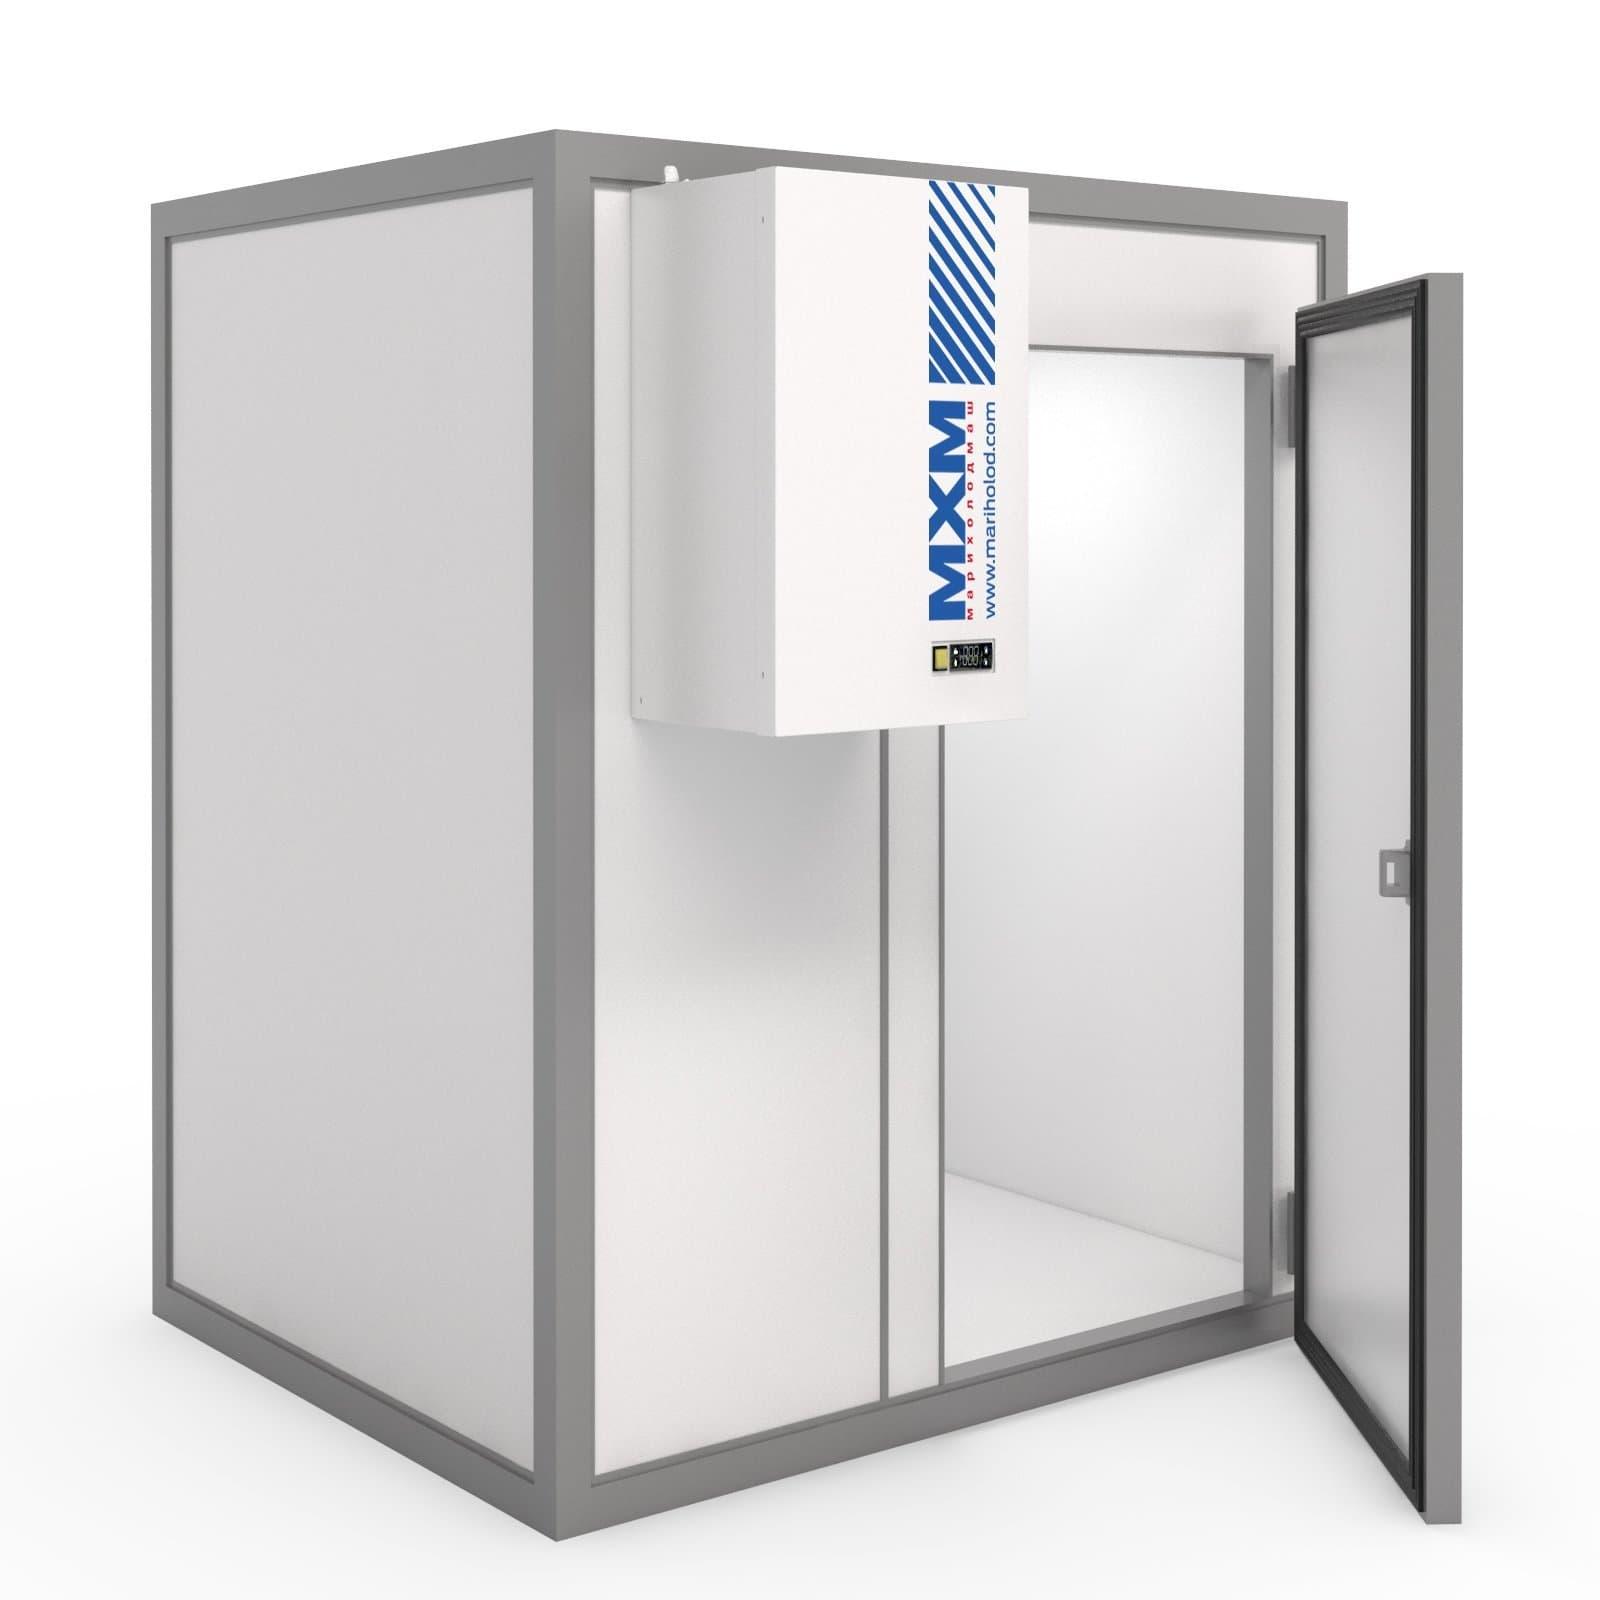 Камера холодильная МХМ КХН-51,61 2260×9760×2720